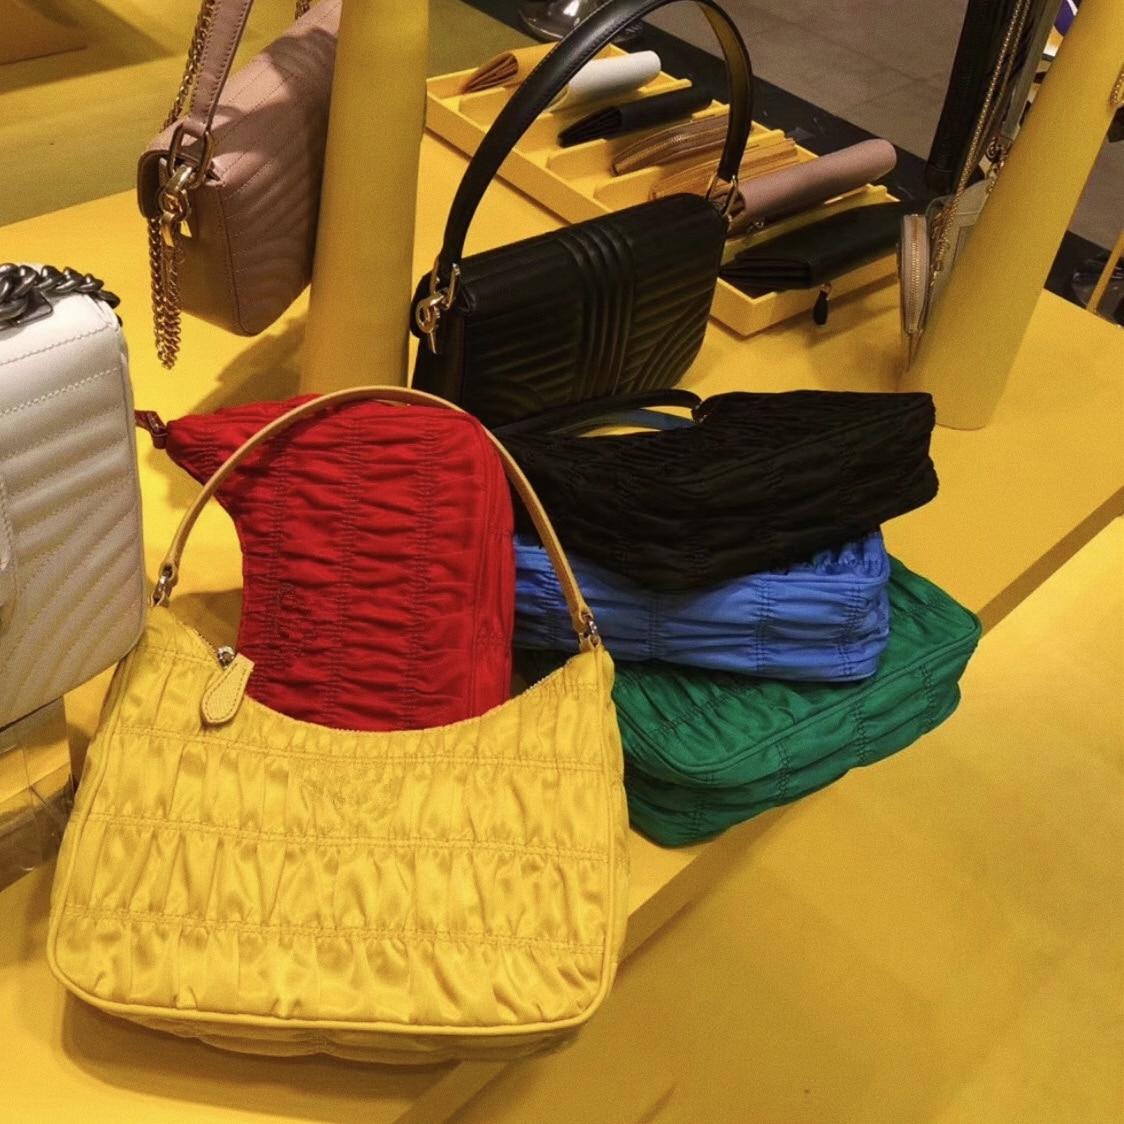 2020 Fold Cloud Totes Bags For Women Underarm Bag PU Leather Womens Handbags Evening Clutch Purses Lady Nylon Handbags New